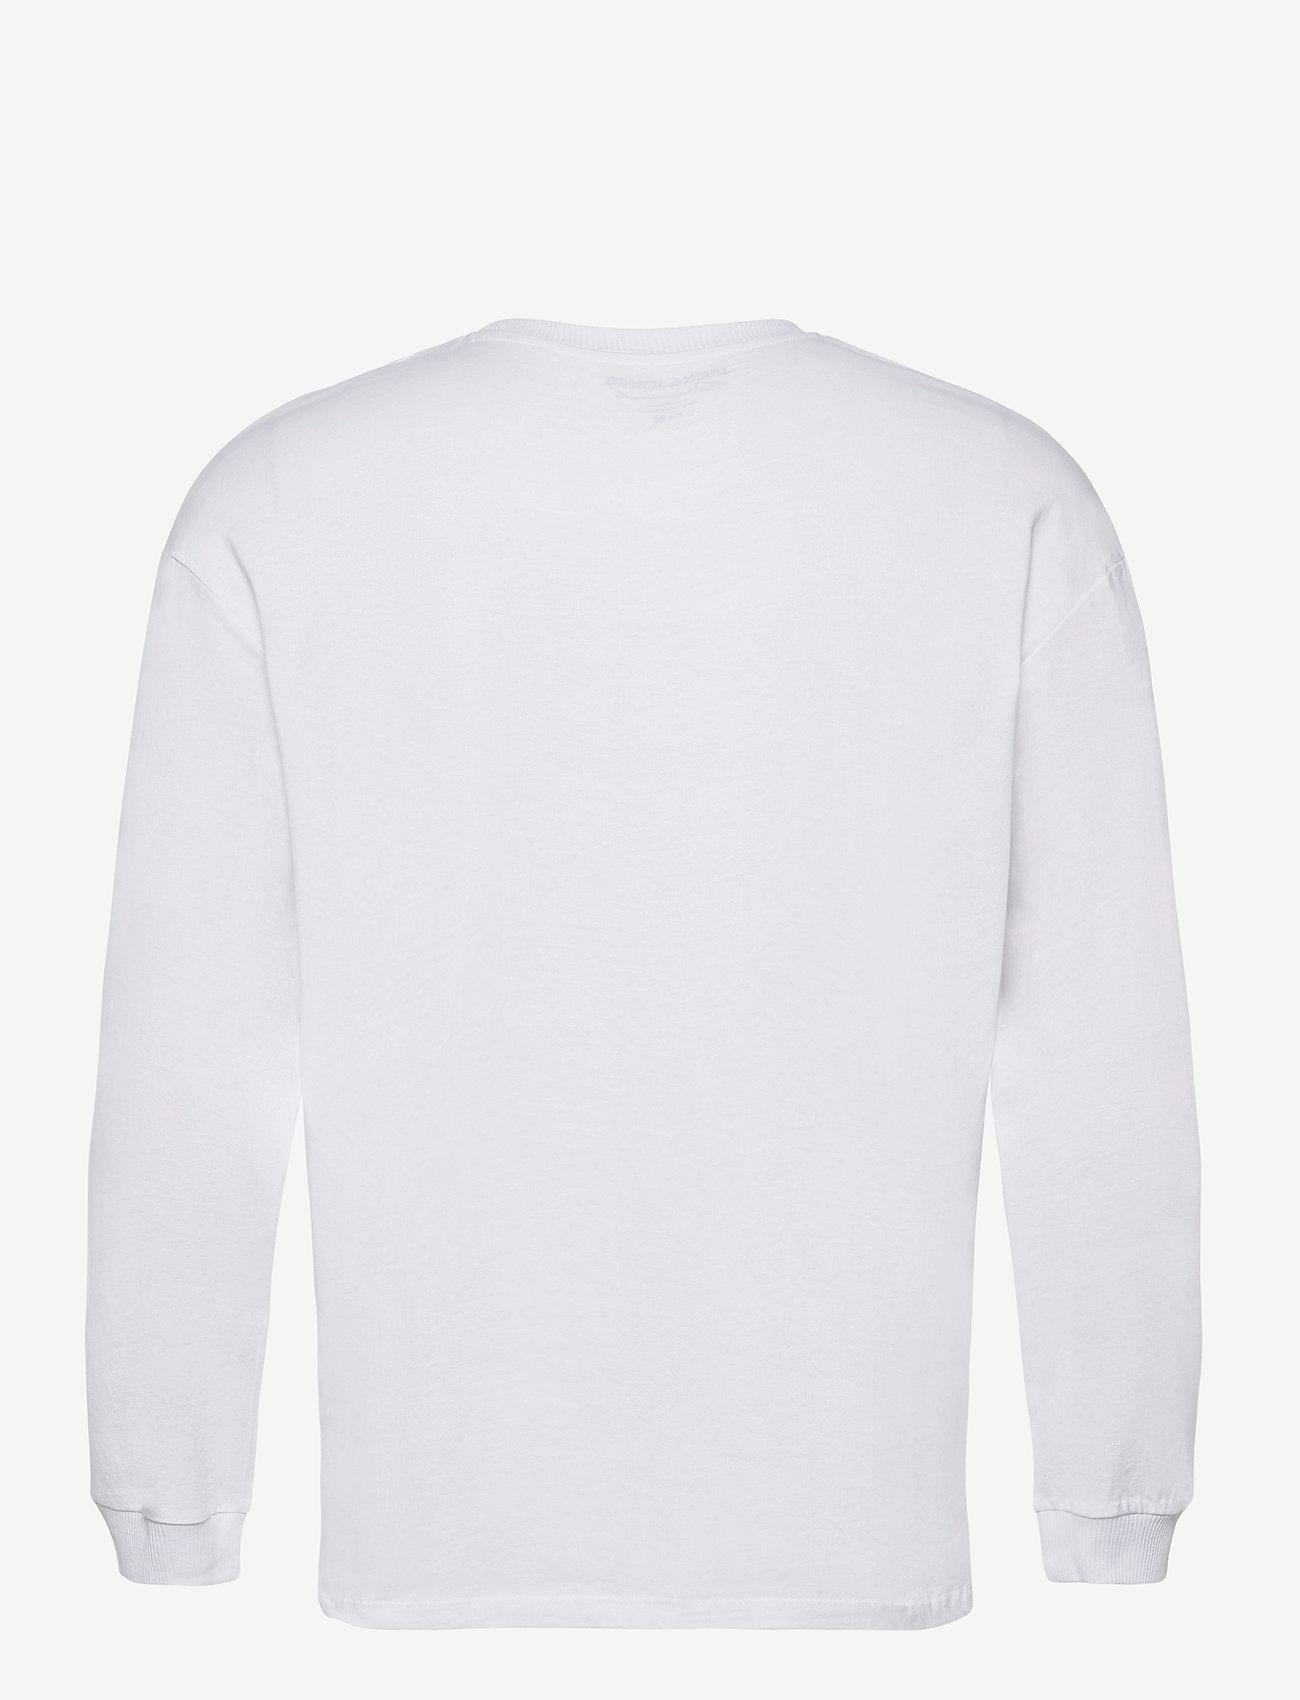 Jack & Jones - JORBRINK TEE LS CREW NECK - basic t-shirts - white - 1